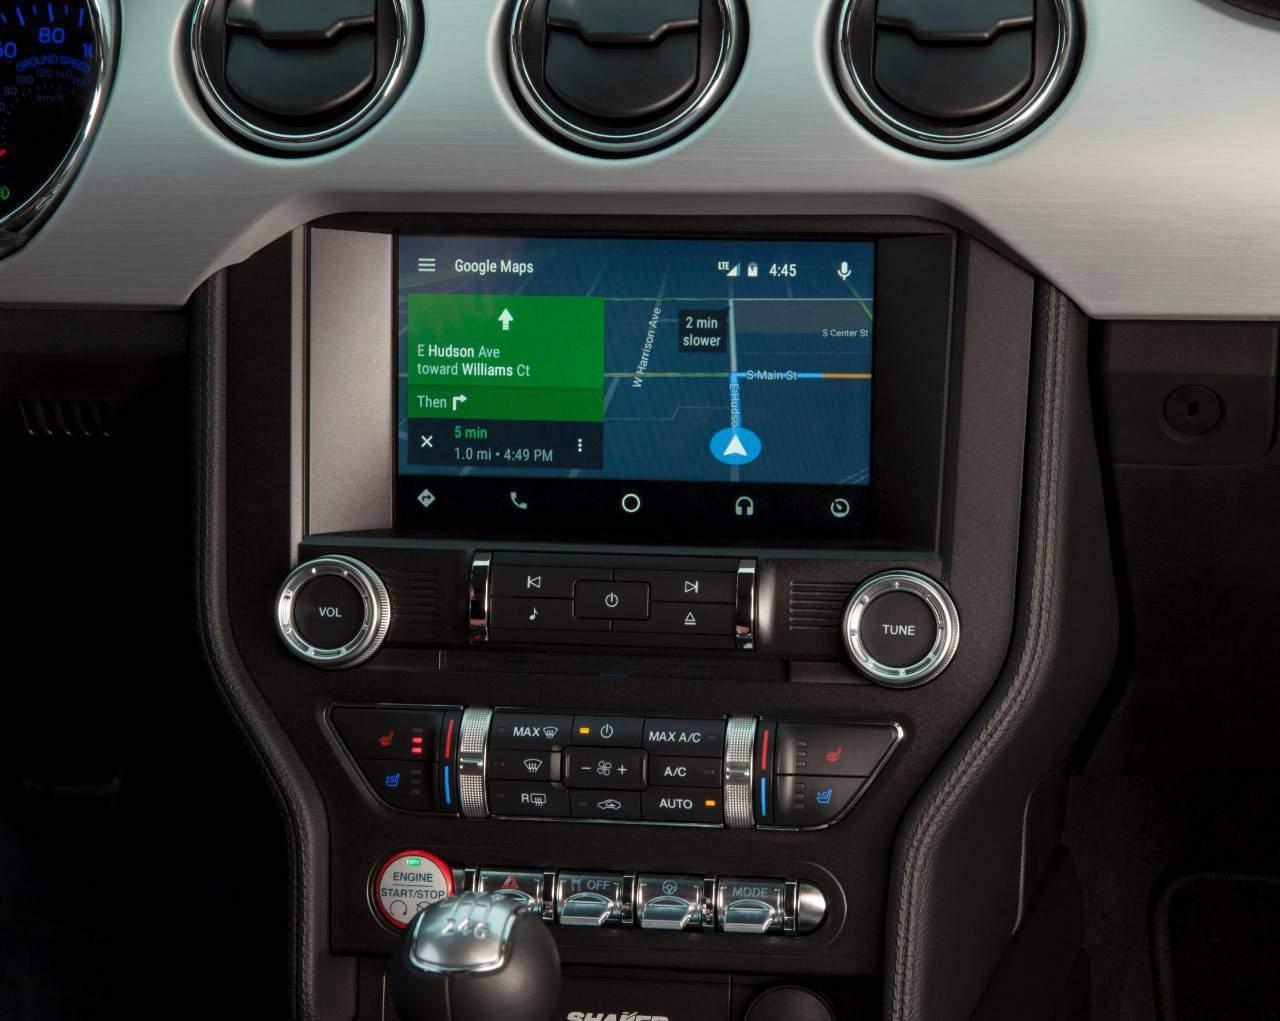 AndroidAuto 8137 HR